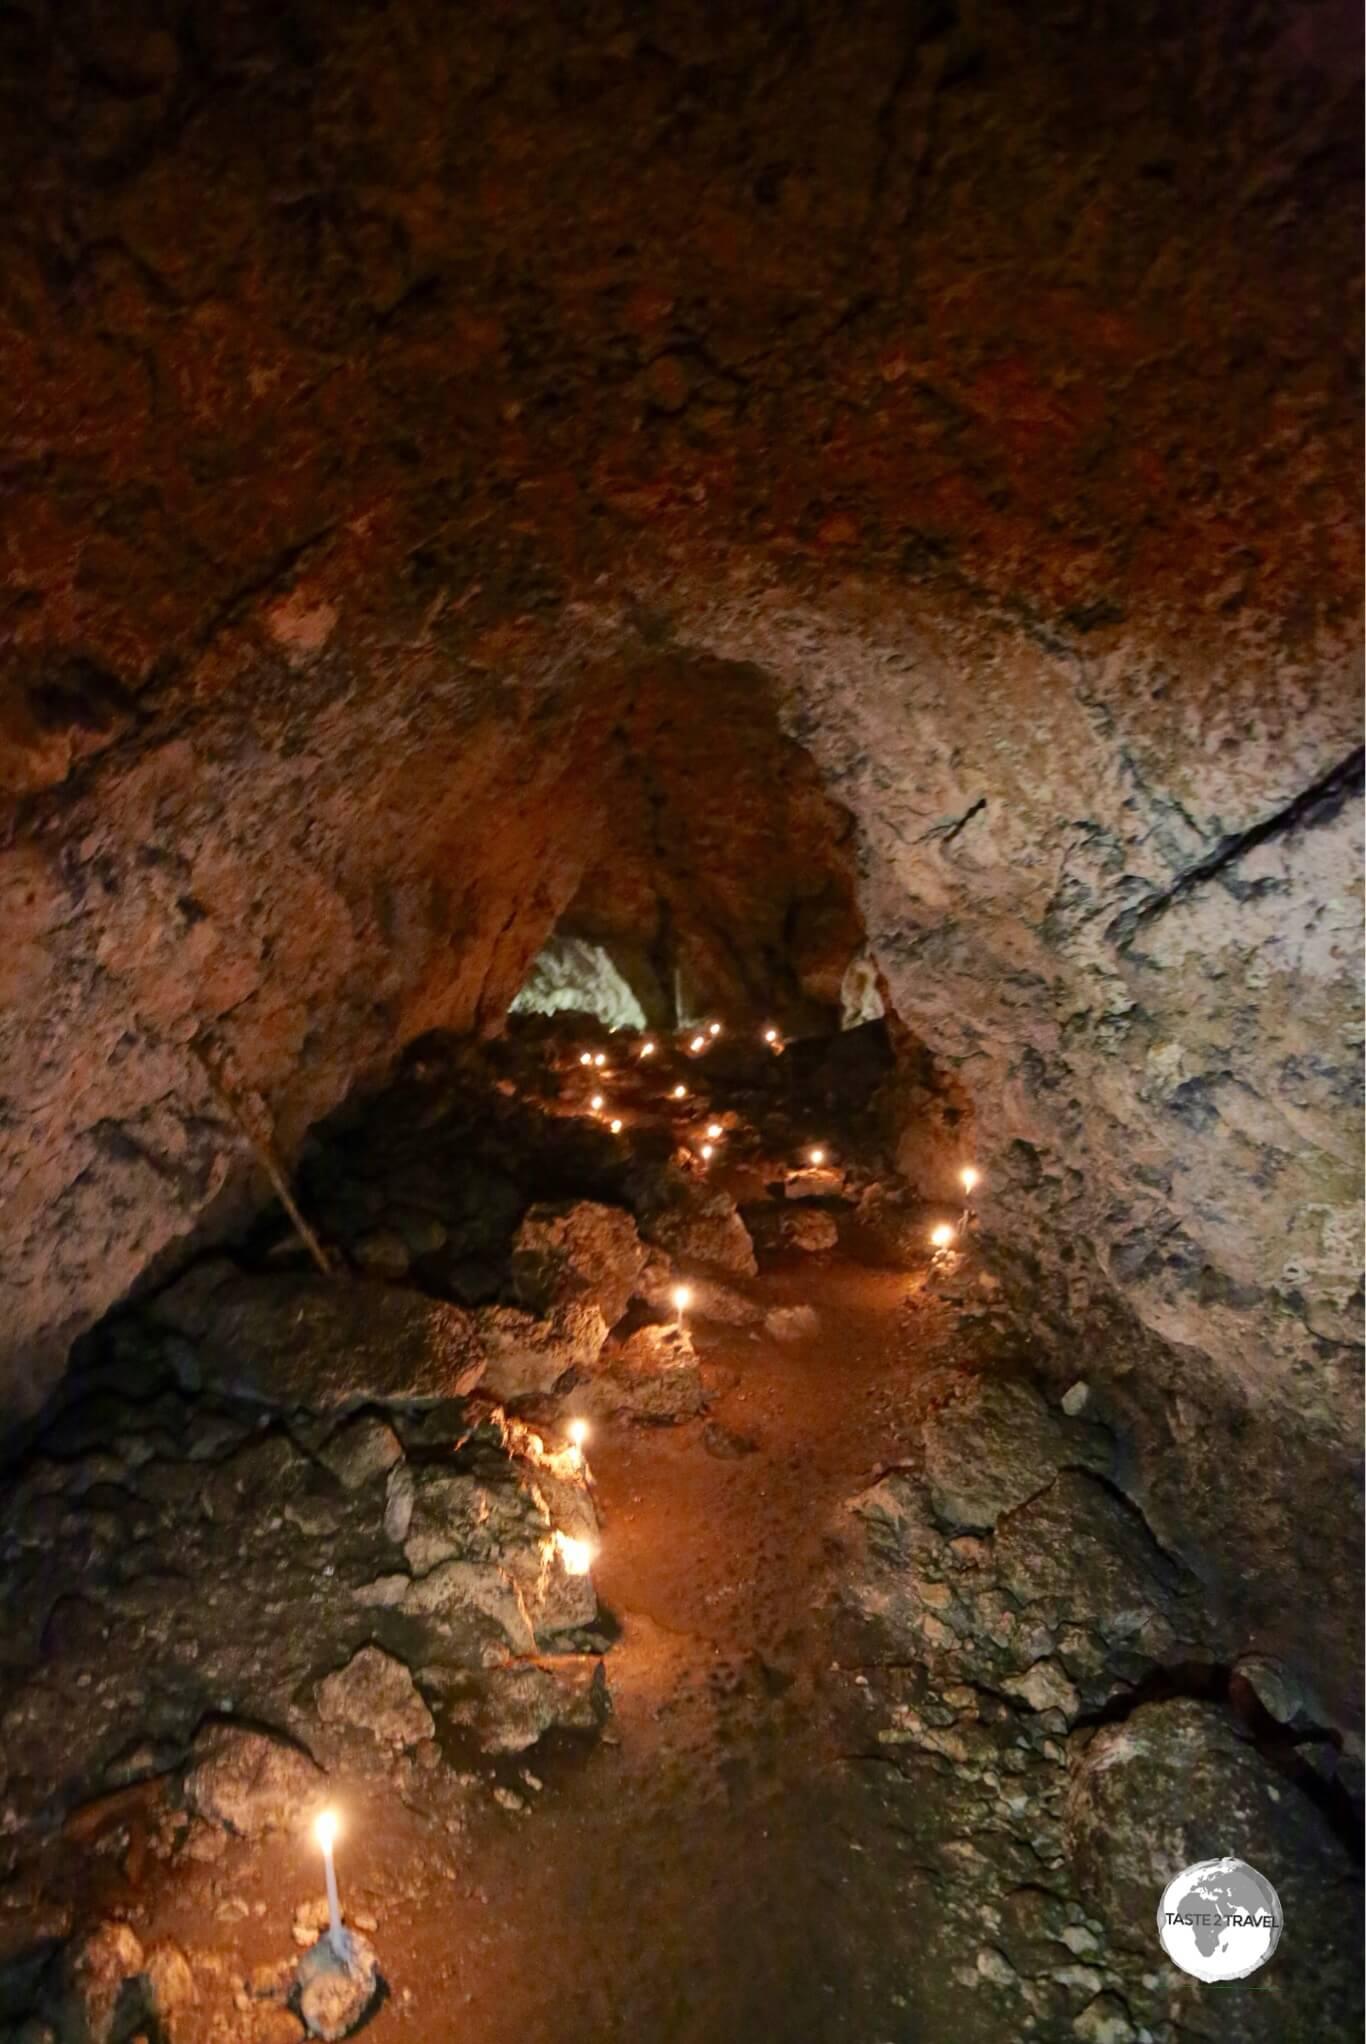 A large cavern on Lelepa island is illuminated by candlelight.